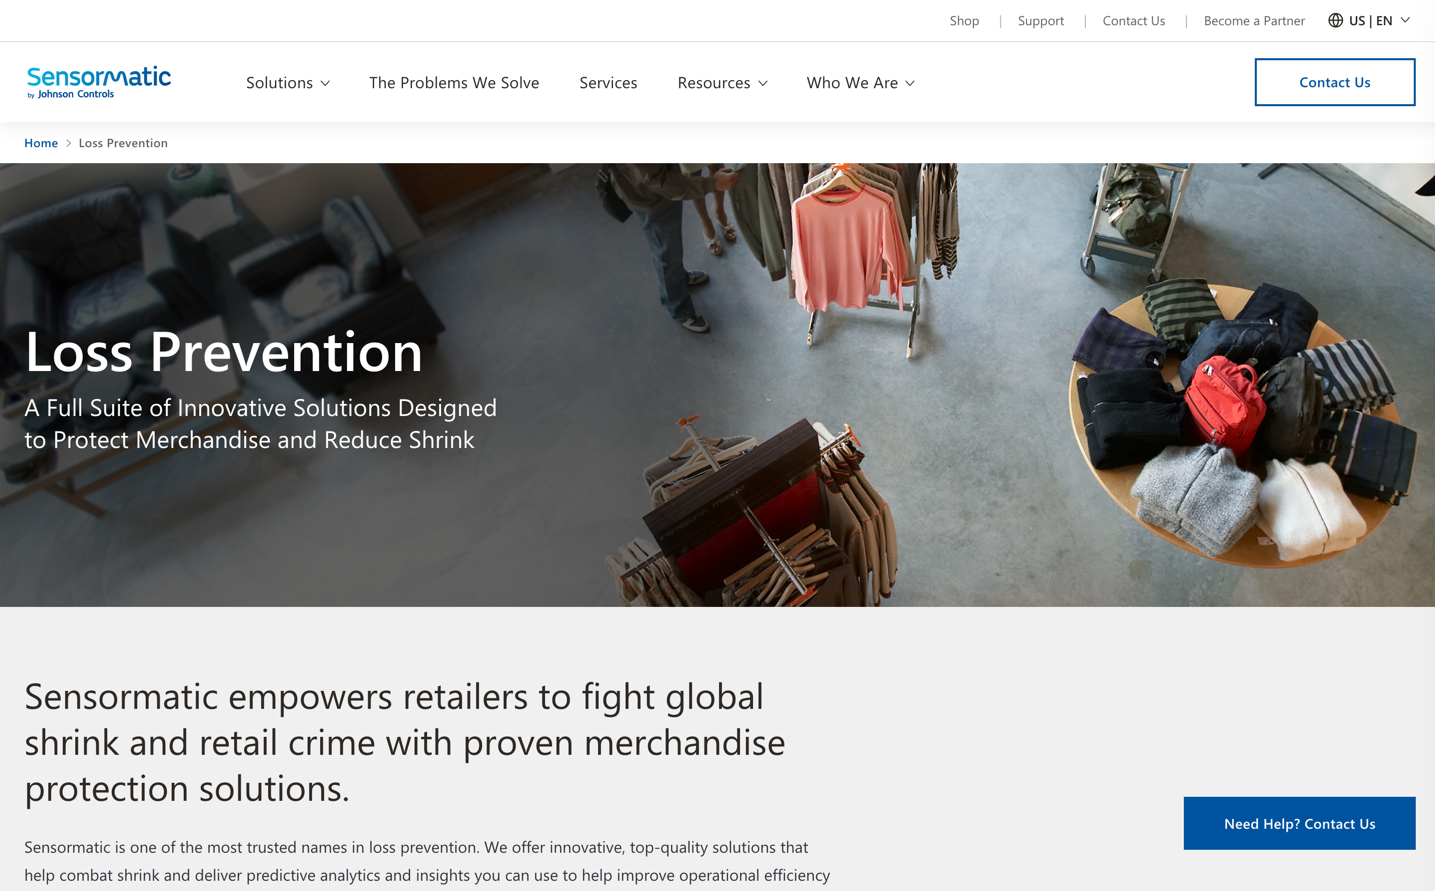 sensormatic homepage